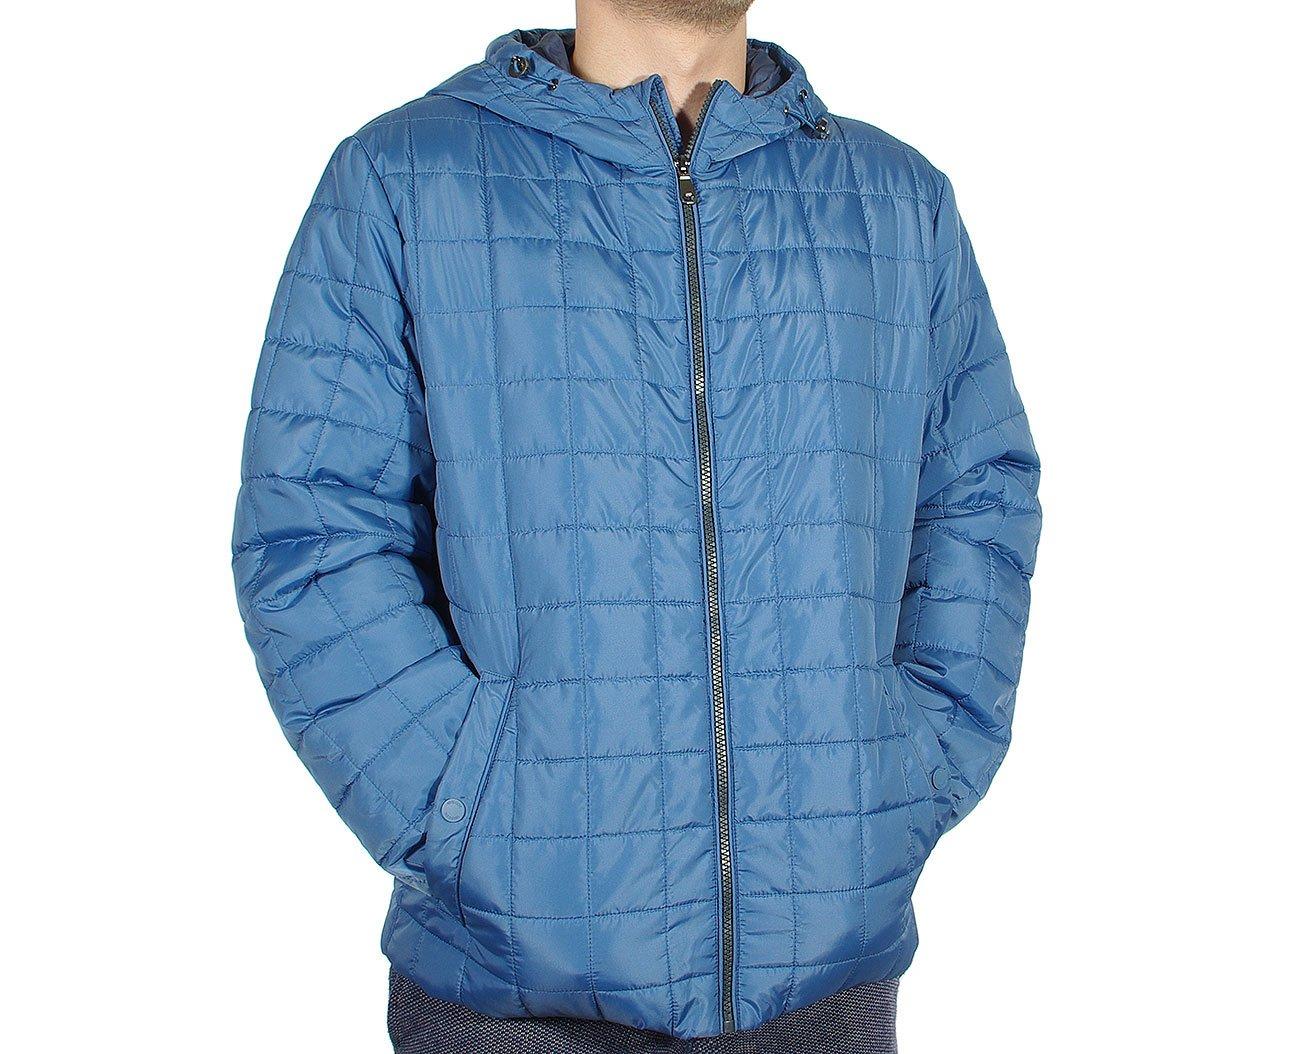 GEOX M8221J kurtka man jacket blue shadow